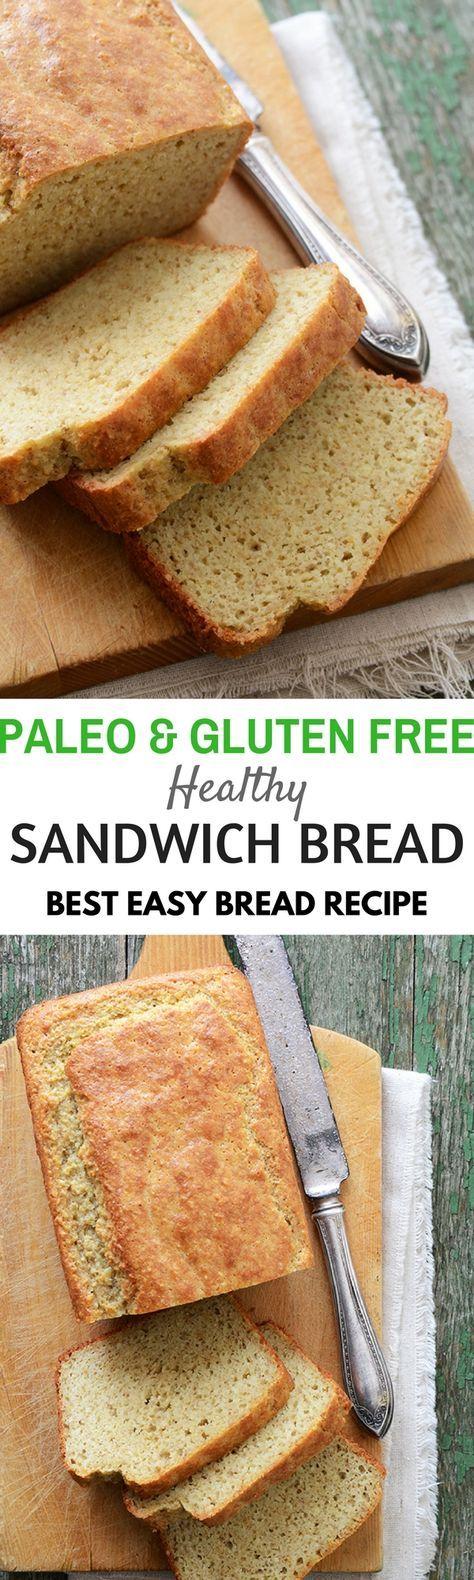 Best paleo sandwich bread. Healthy gluten free best bread recipes for the paleo diet.